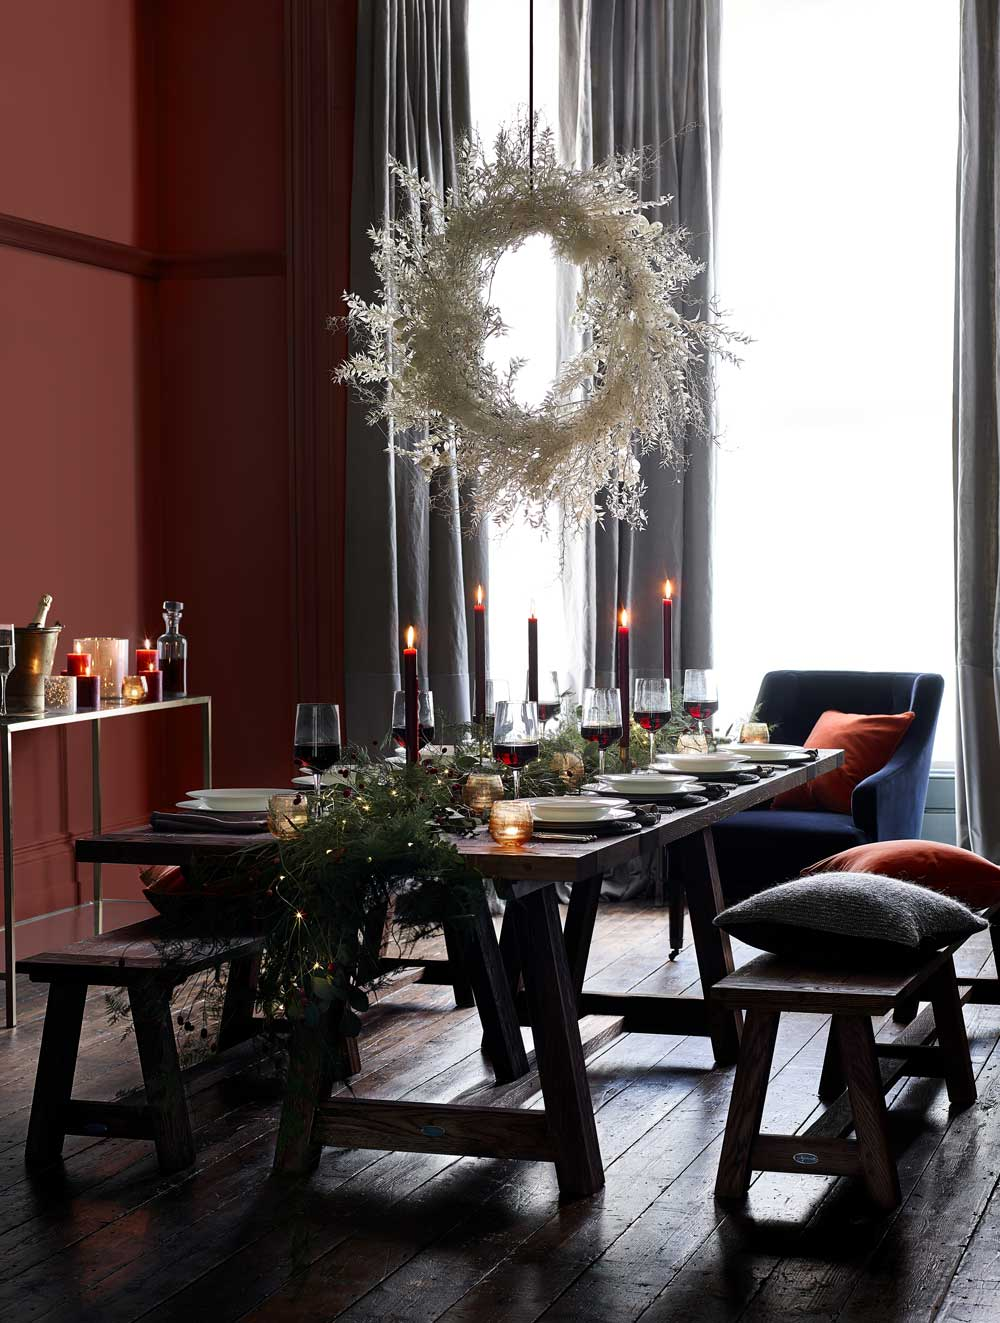 tischdeko-weihnachten-neptune-decohome.de_